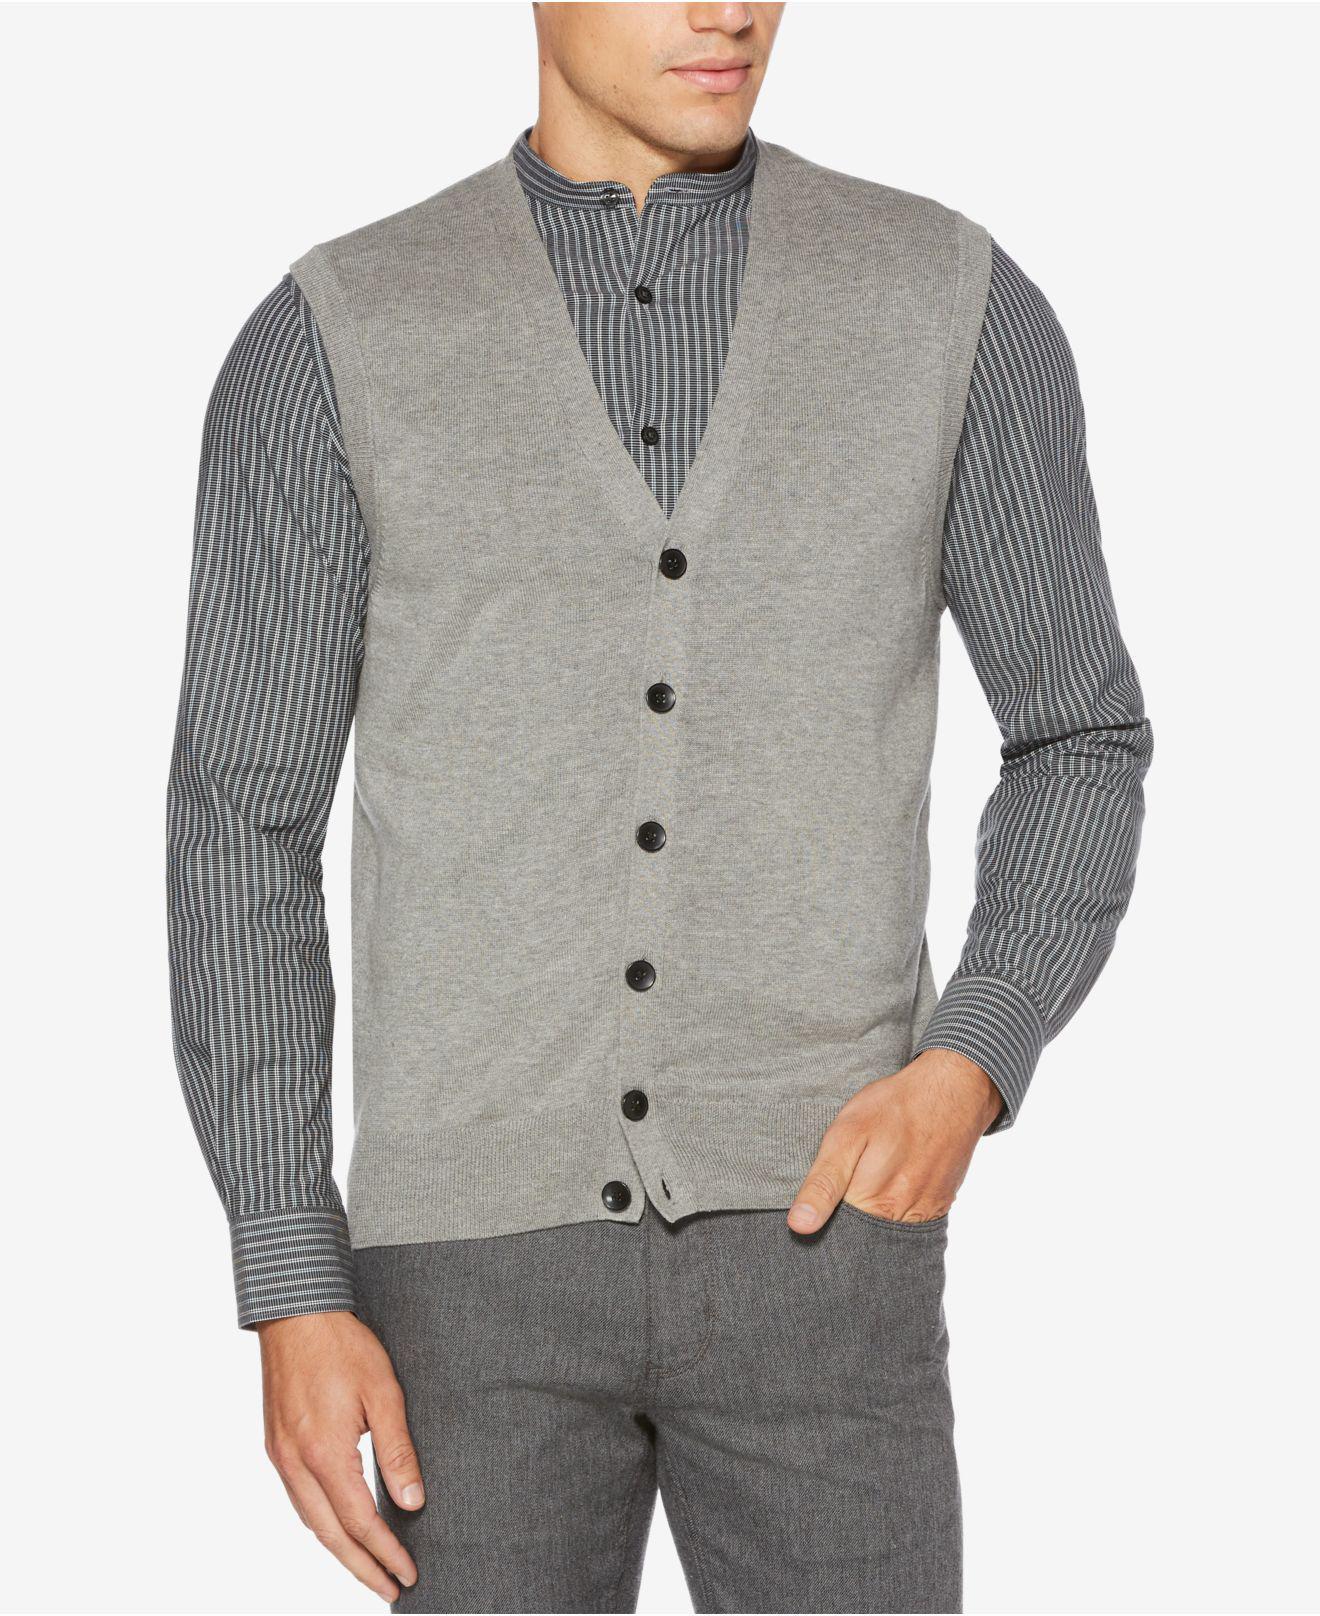 5d4571c6e3 Lyst - Perry Ellis Sweater Vest in Gray for Men